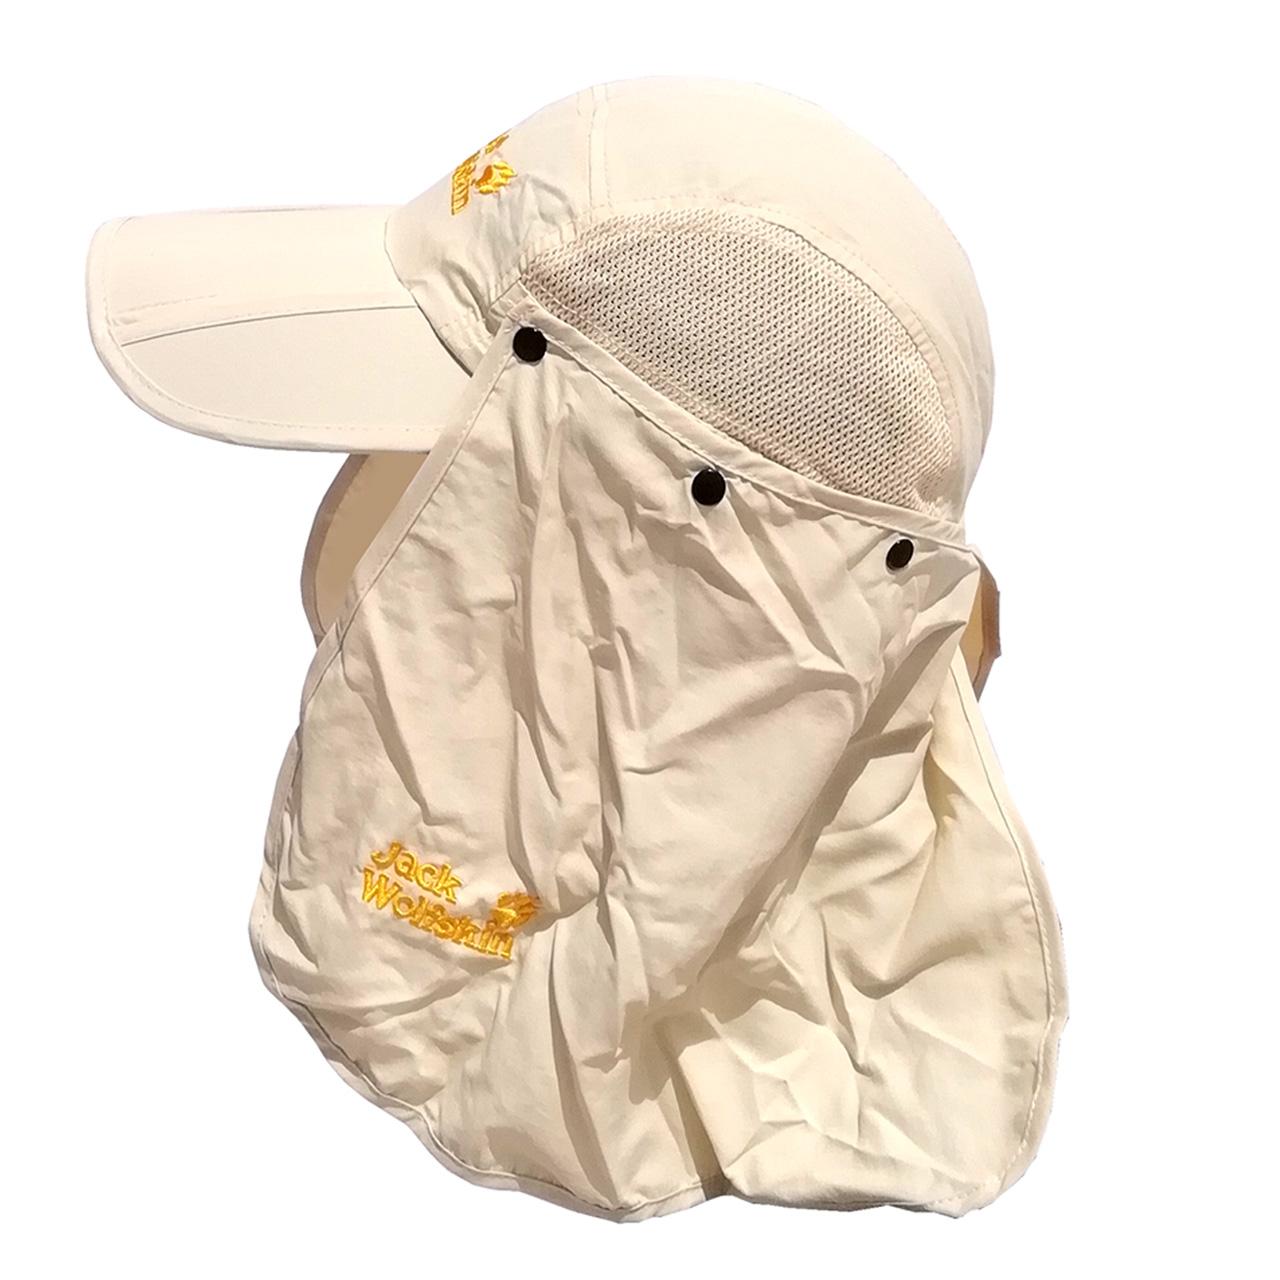 کلاه کوهنوردی جک ولف اسکین مدل سه تکه کد 06 سایز L